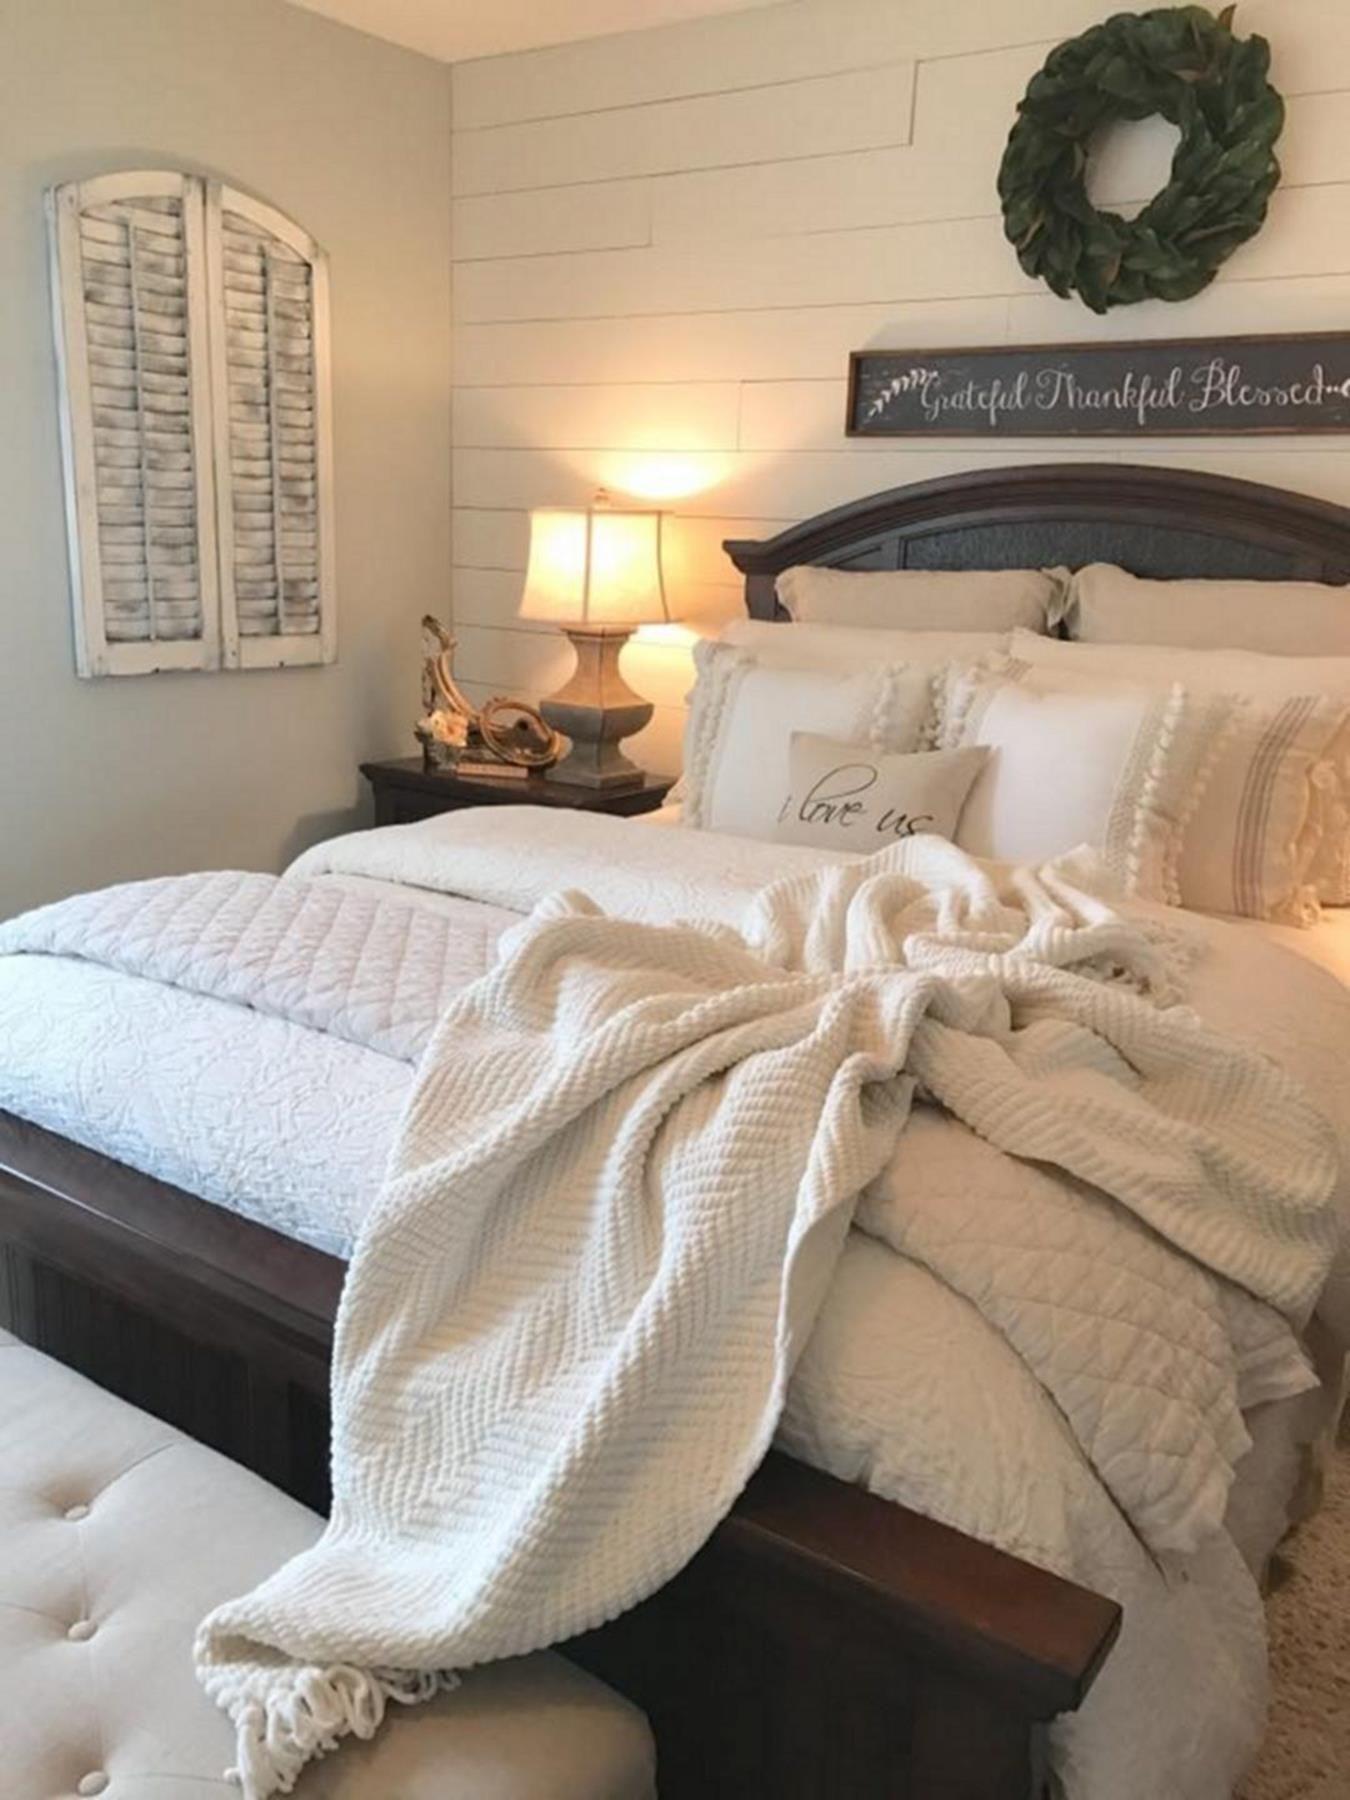 Farmhouse Master Bedroom Decorating Ideas 29 50